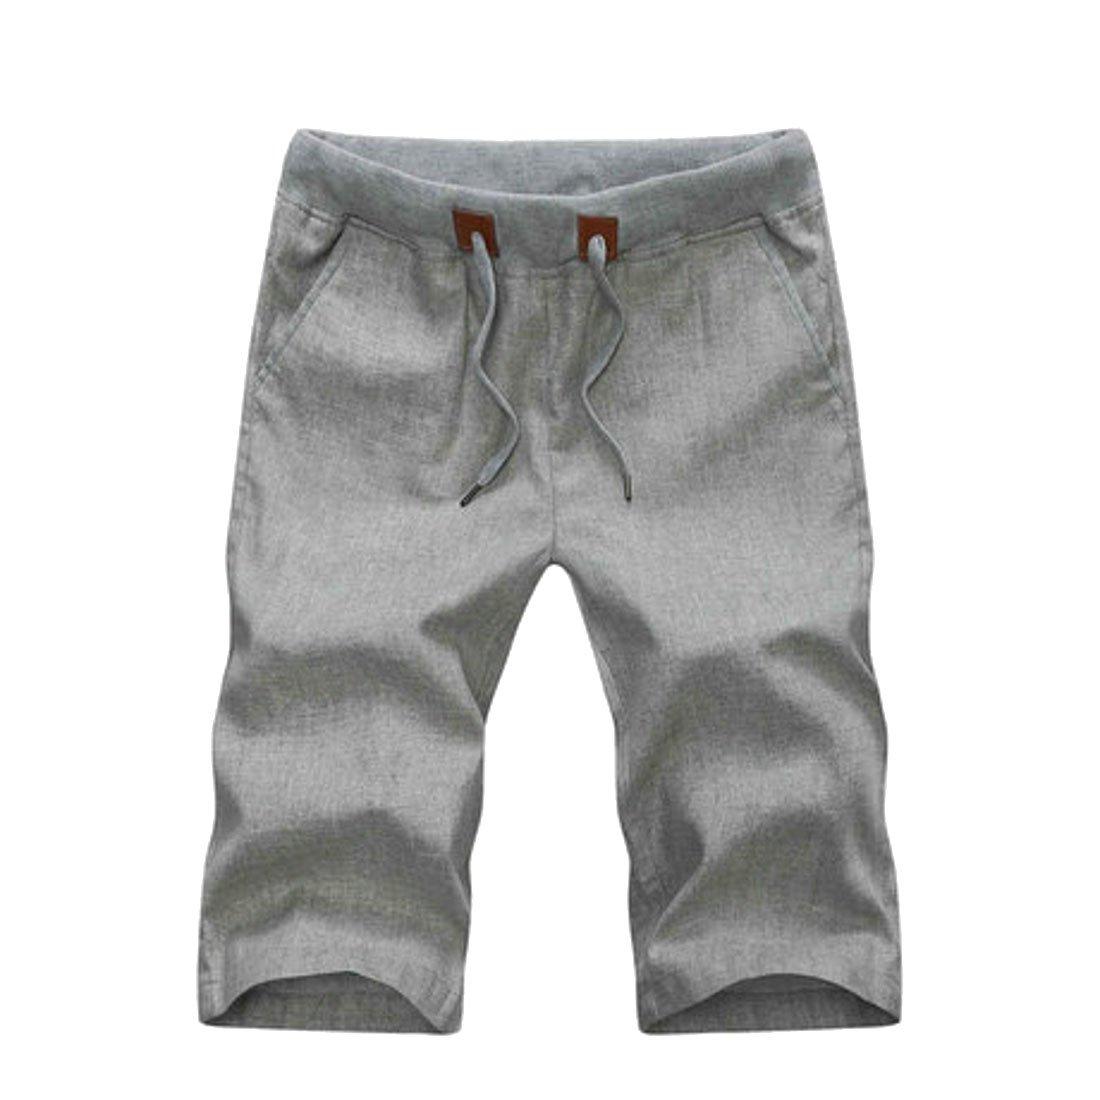 YUELANDE Men Solid Cotton Linen Drawstring Casual Beach Shorts Boardshort Swim Trunk